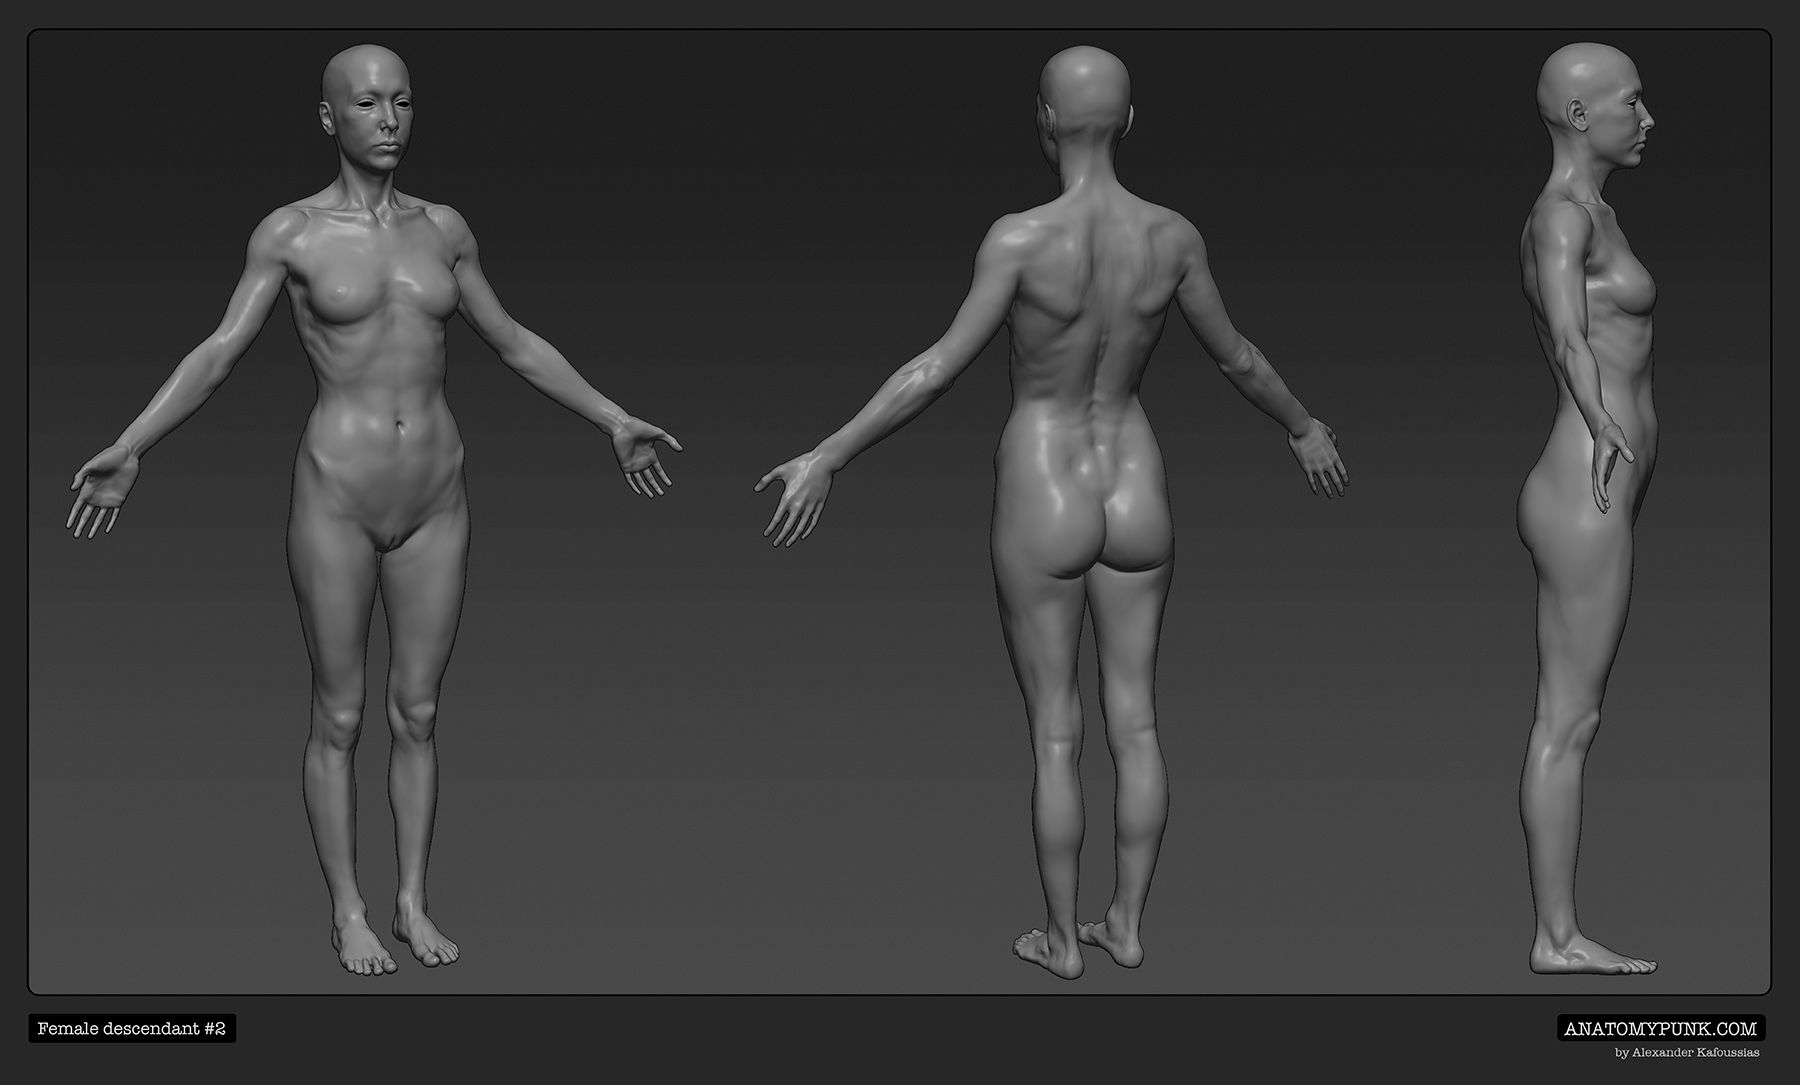 Female Descendant 2 By Alexander Kafoussias Anatomypunk